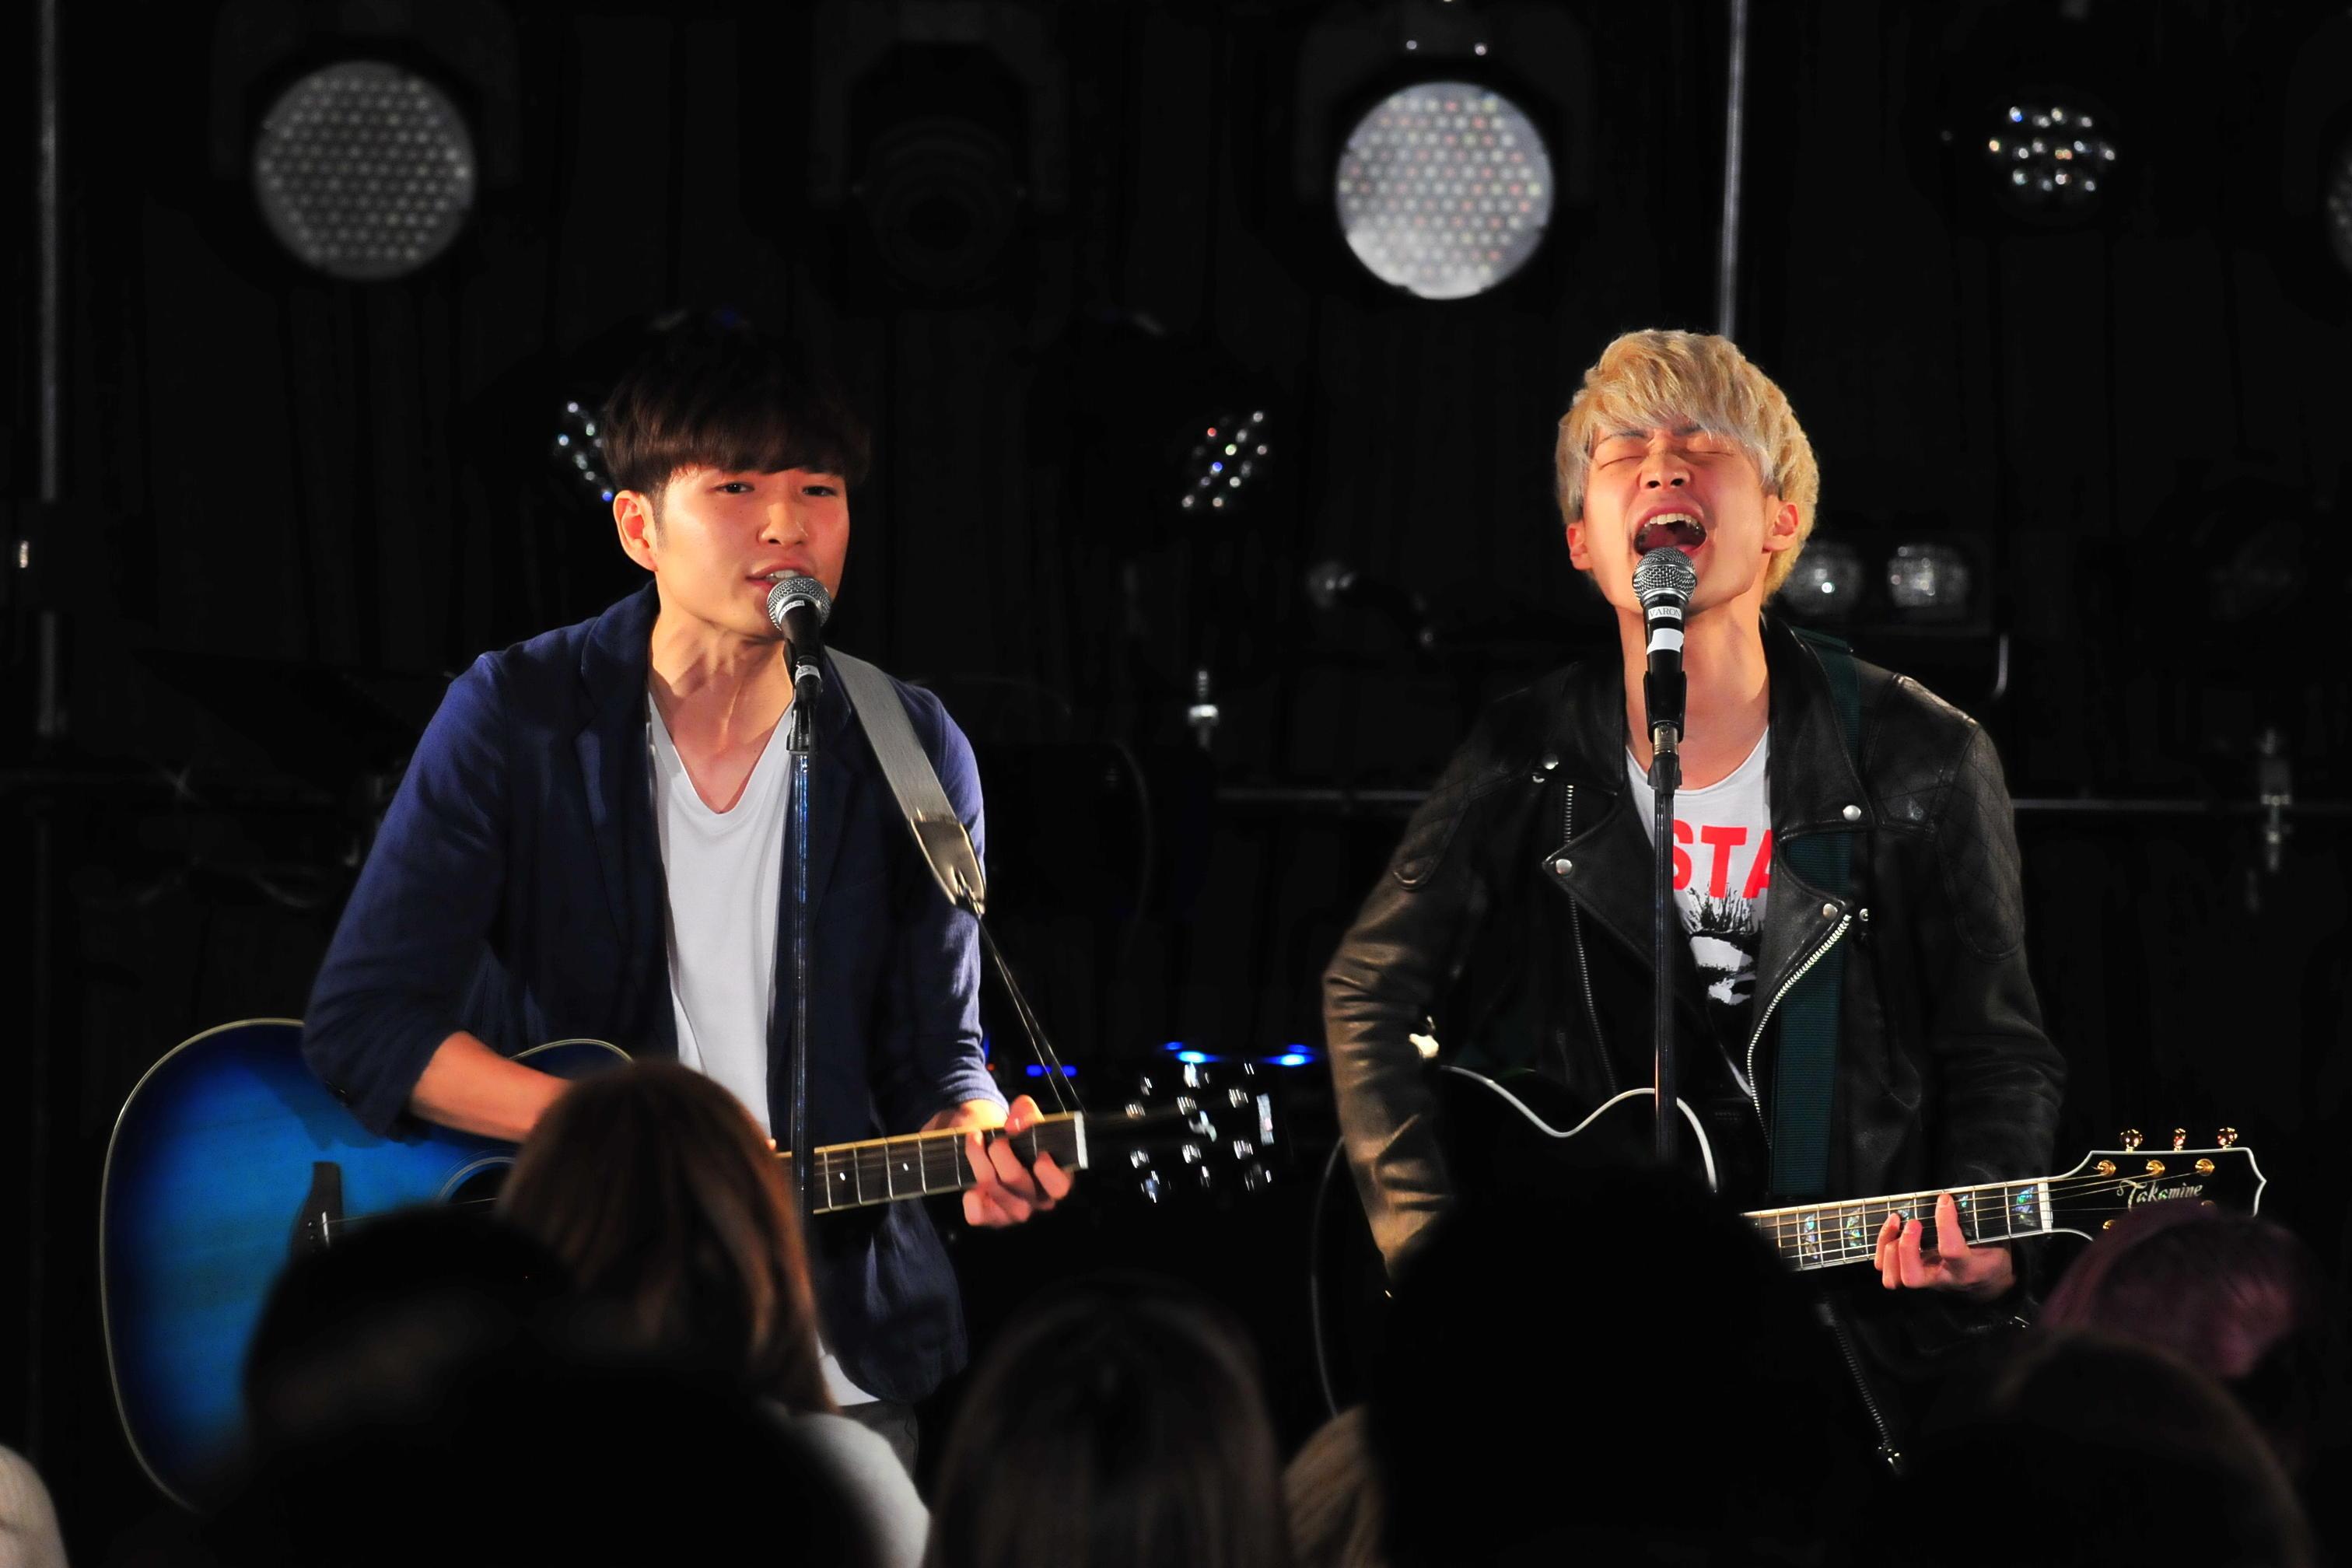 http://news.yoshimoto.co.jp/20170125191913-d34f88ec7896196729df8fbf3c7bea1848a0538e.jpg